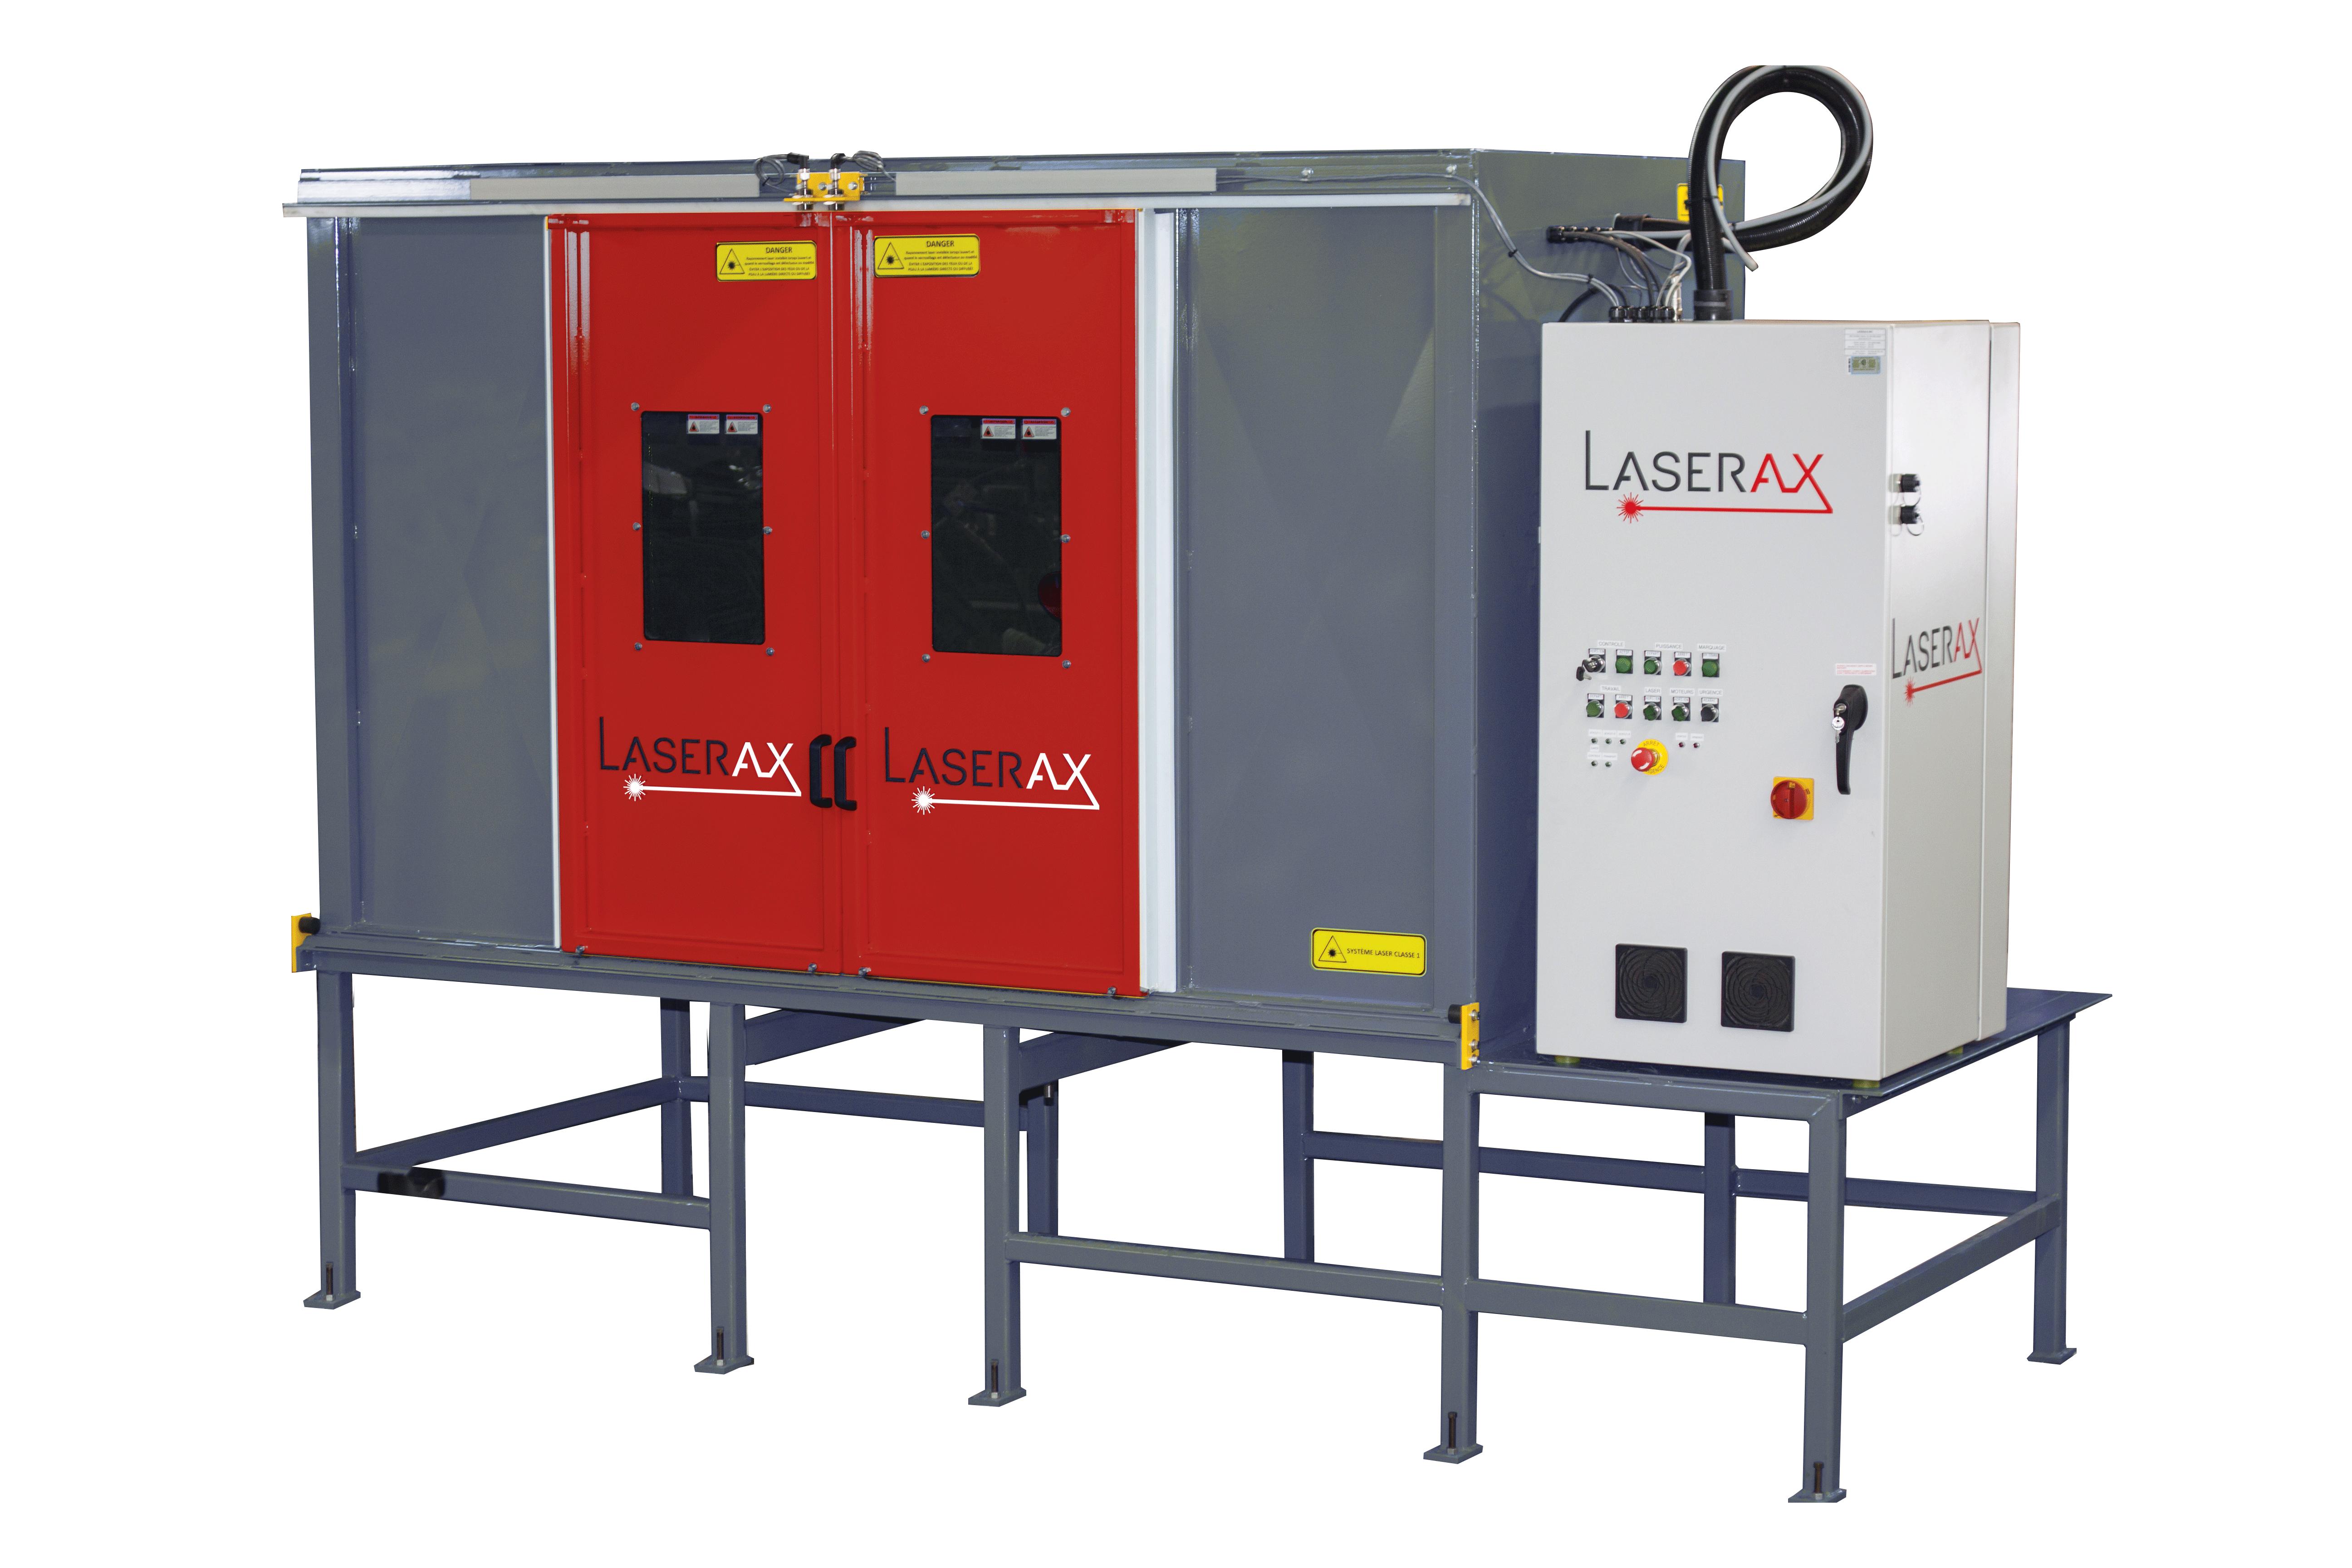 Image: Laserax's Standalone Safety Enclosure